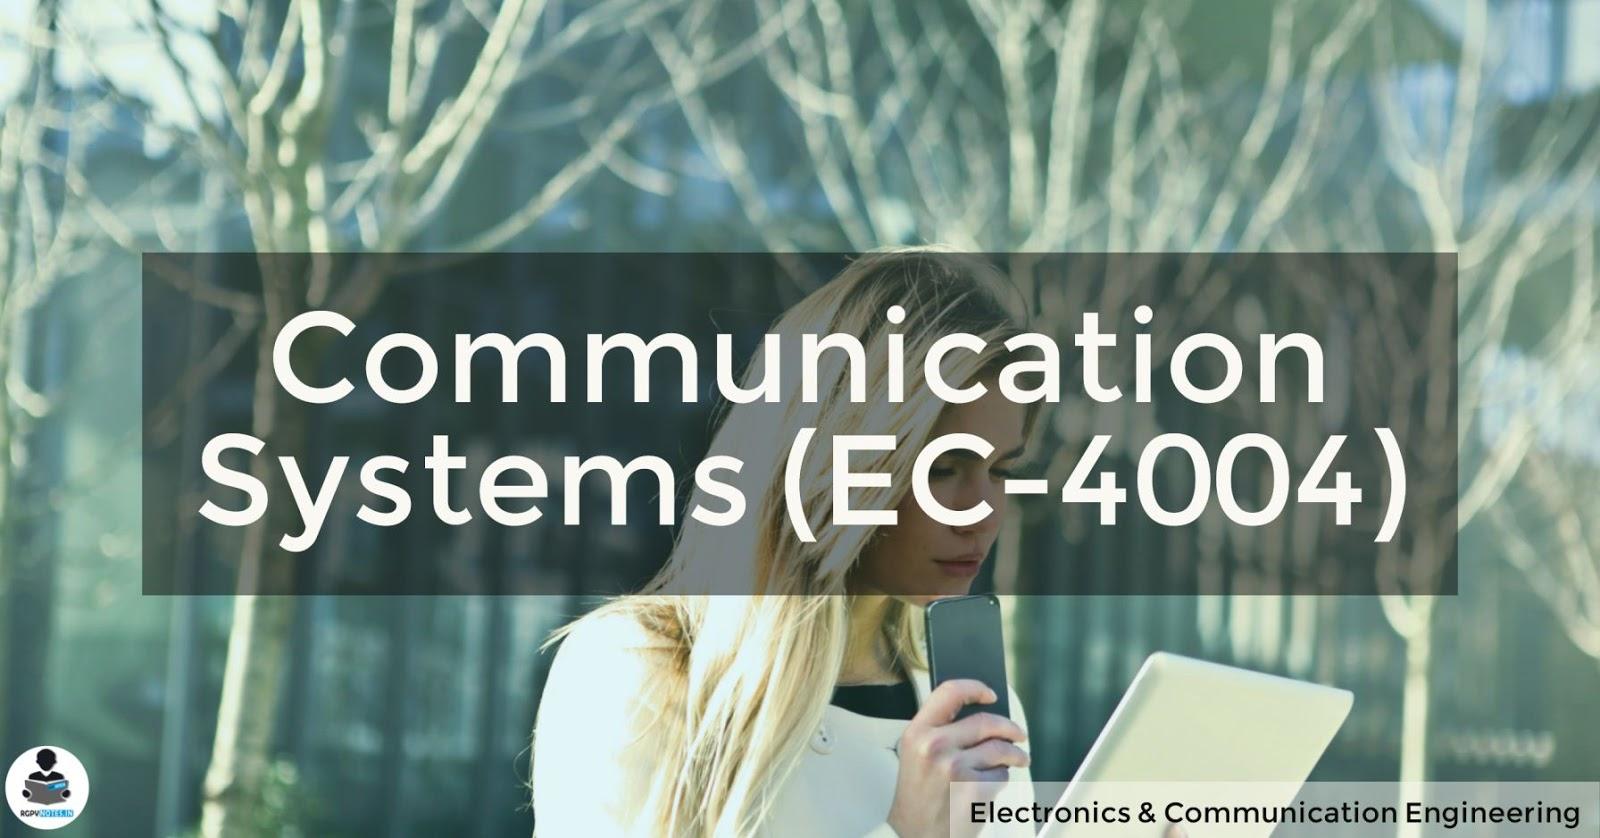 Communication Systems (EC-4004)